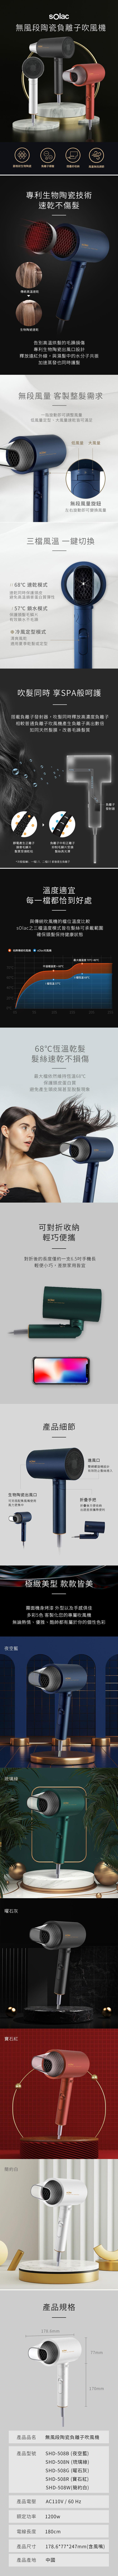 sOlac 負離子生物陶瓷吹風機 白 SHD-508W